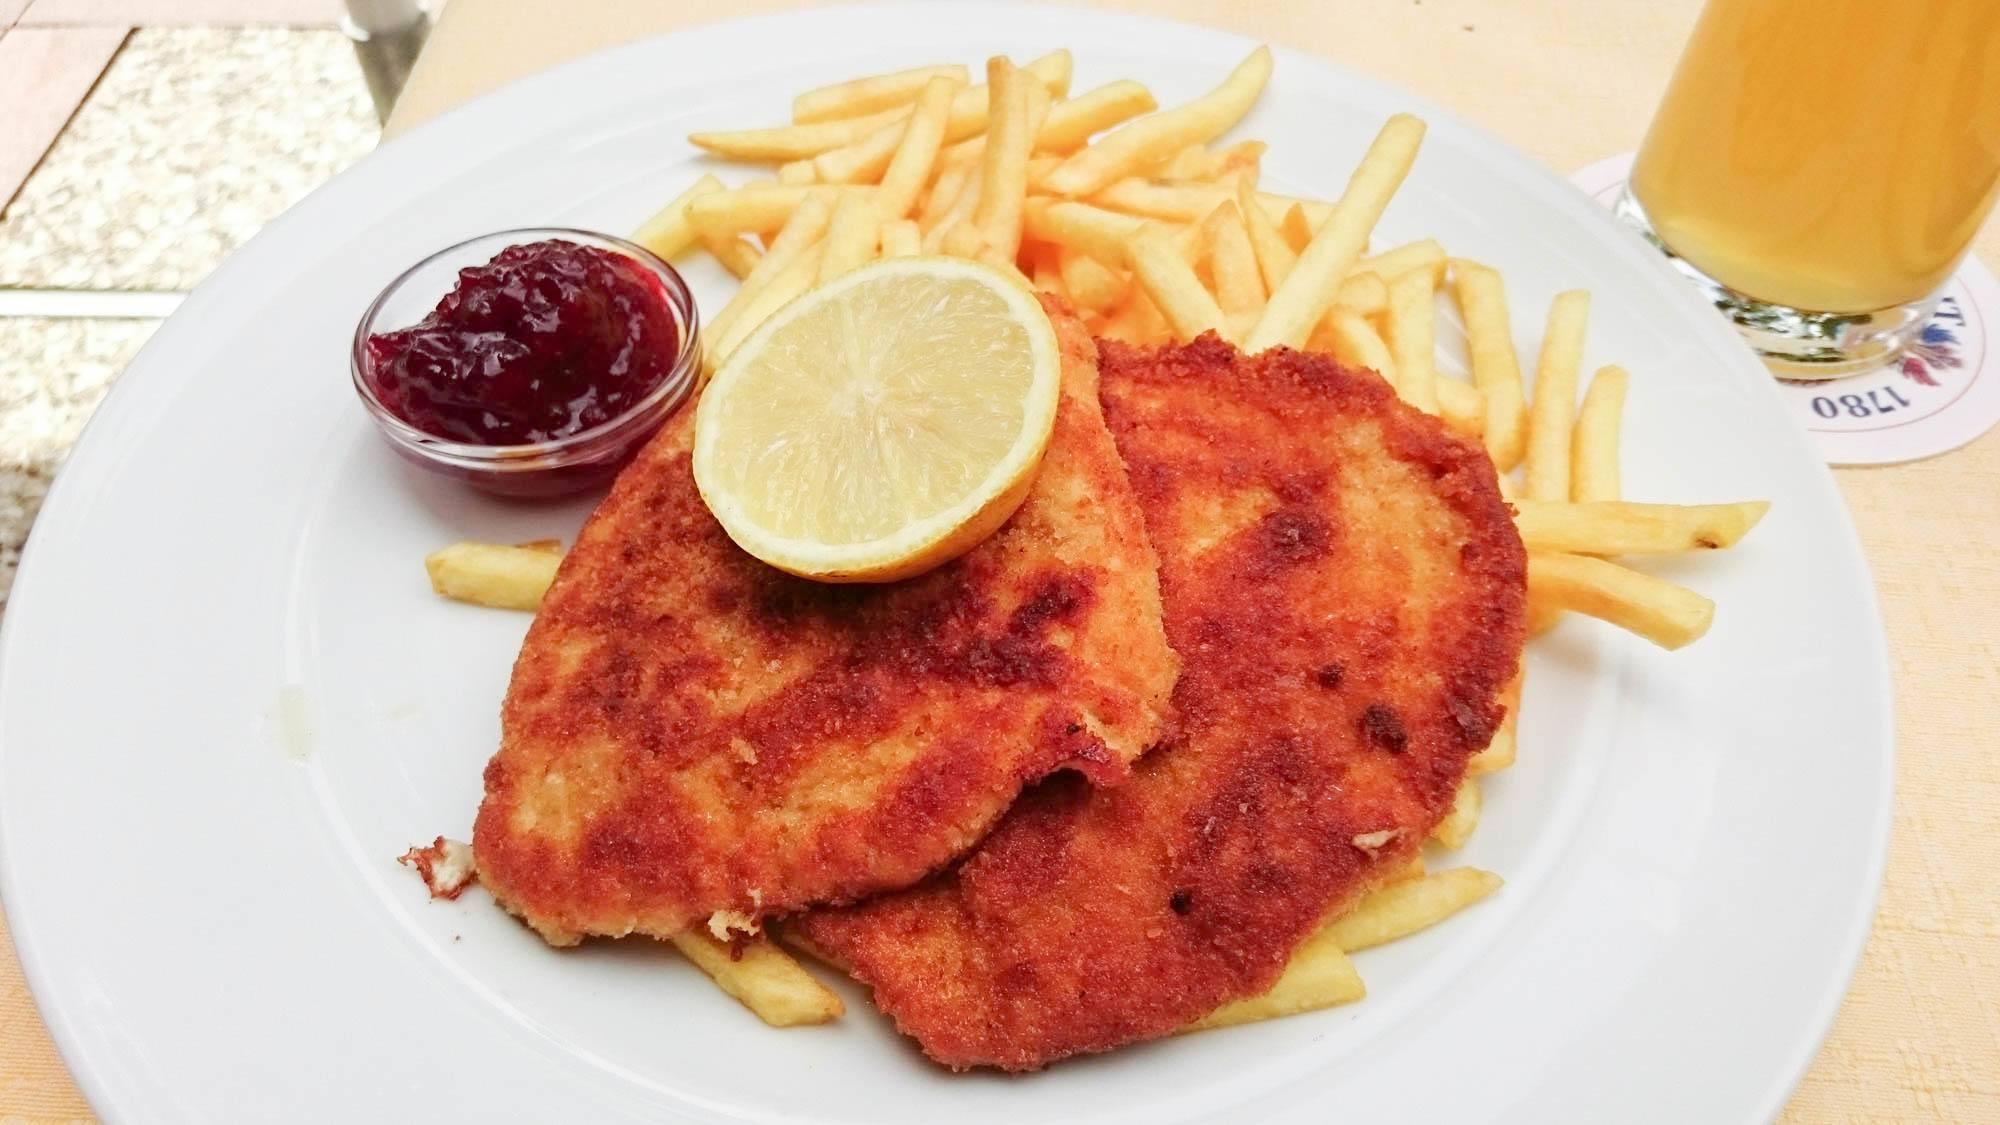 Typical schnitzel with fries and preiselbeeren sauce.